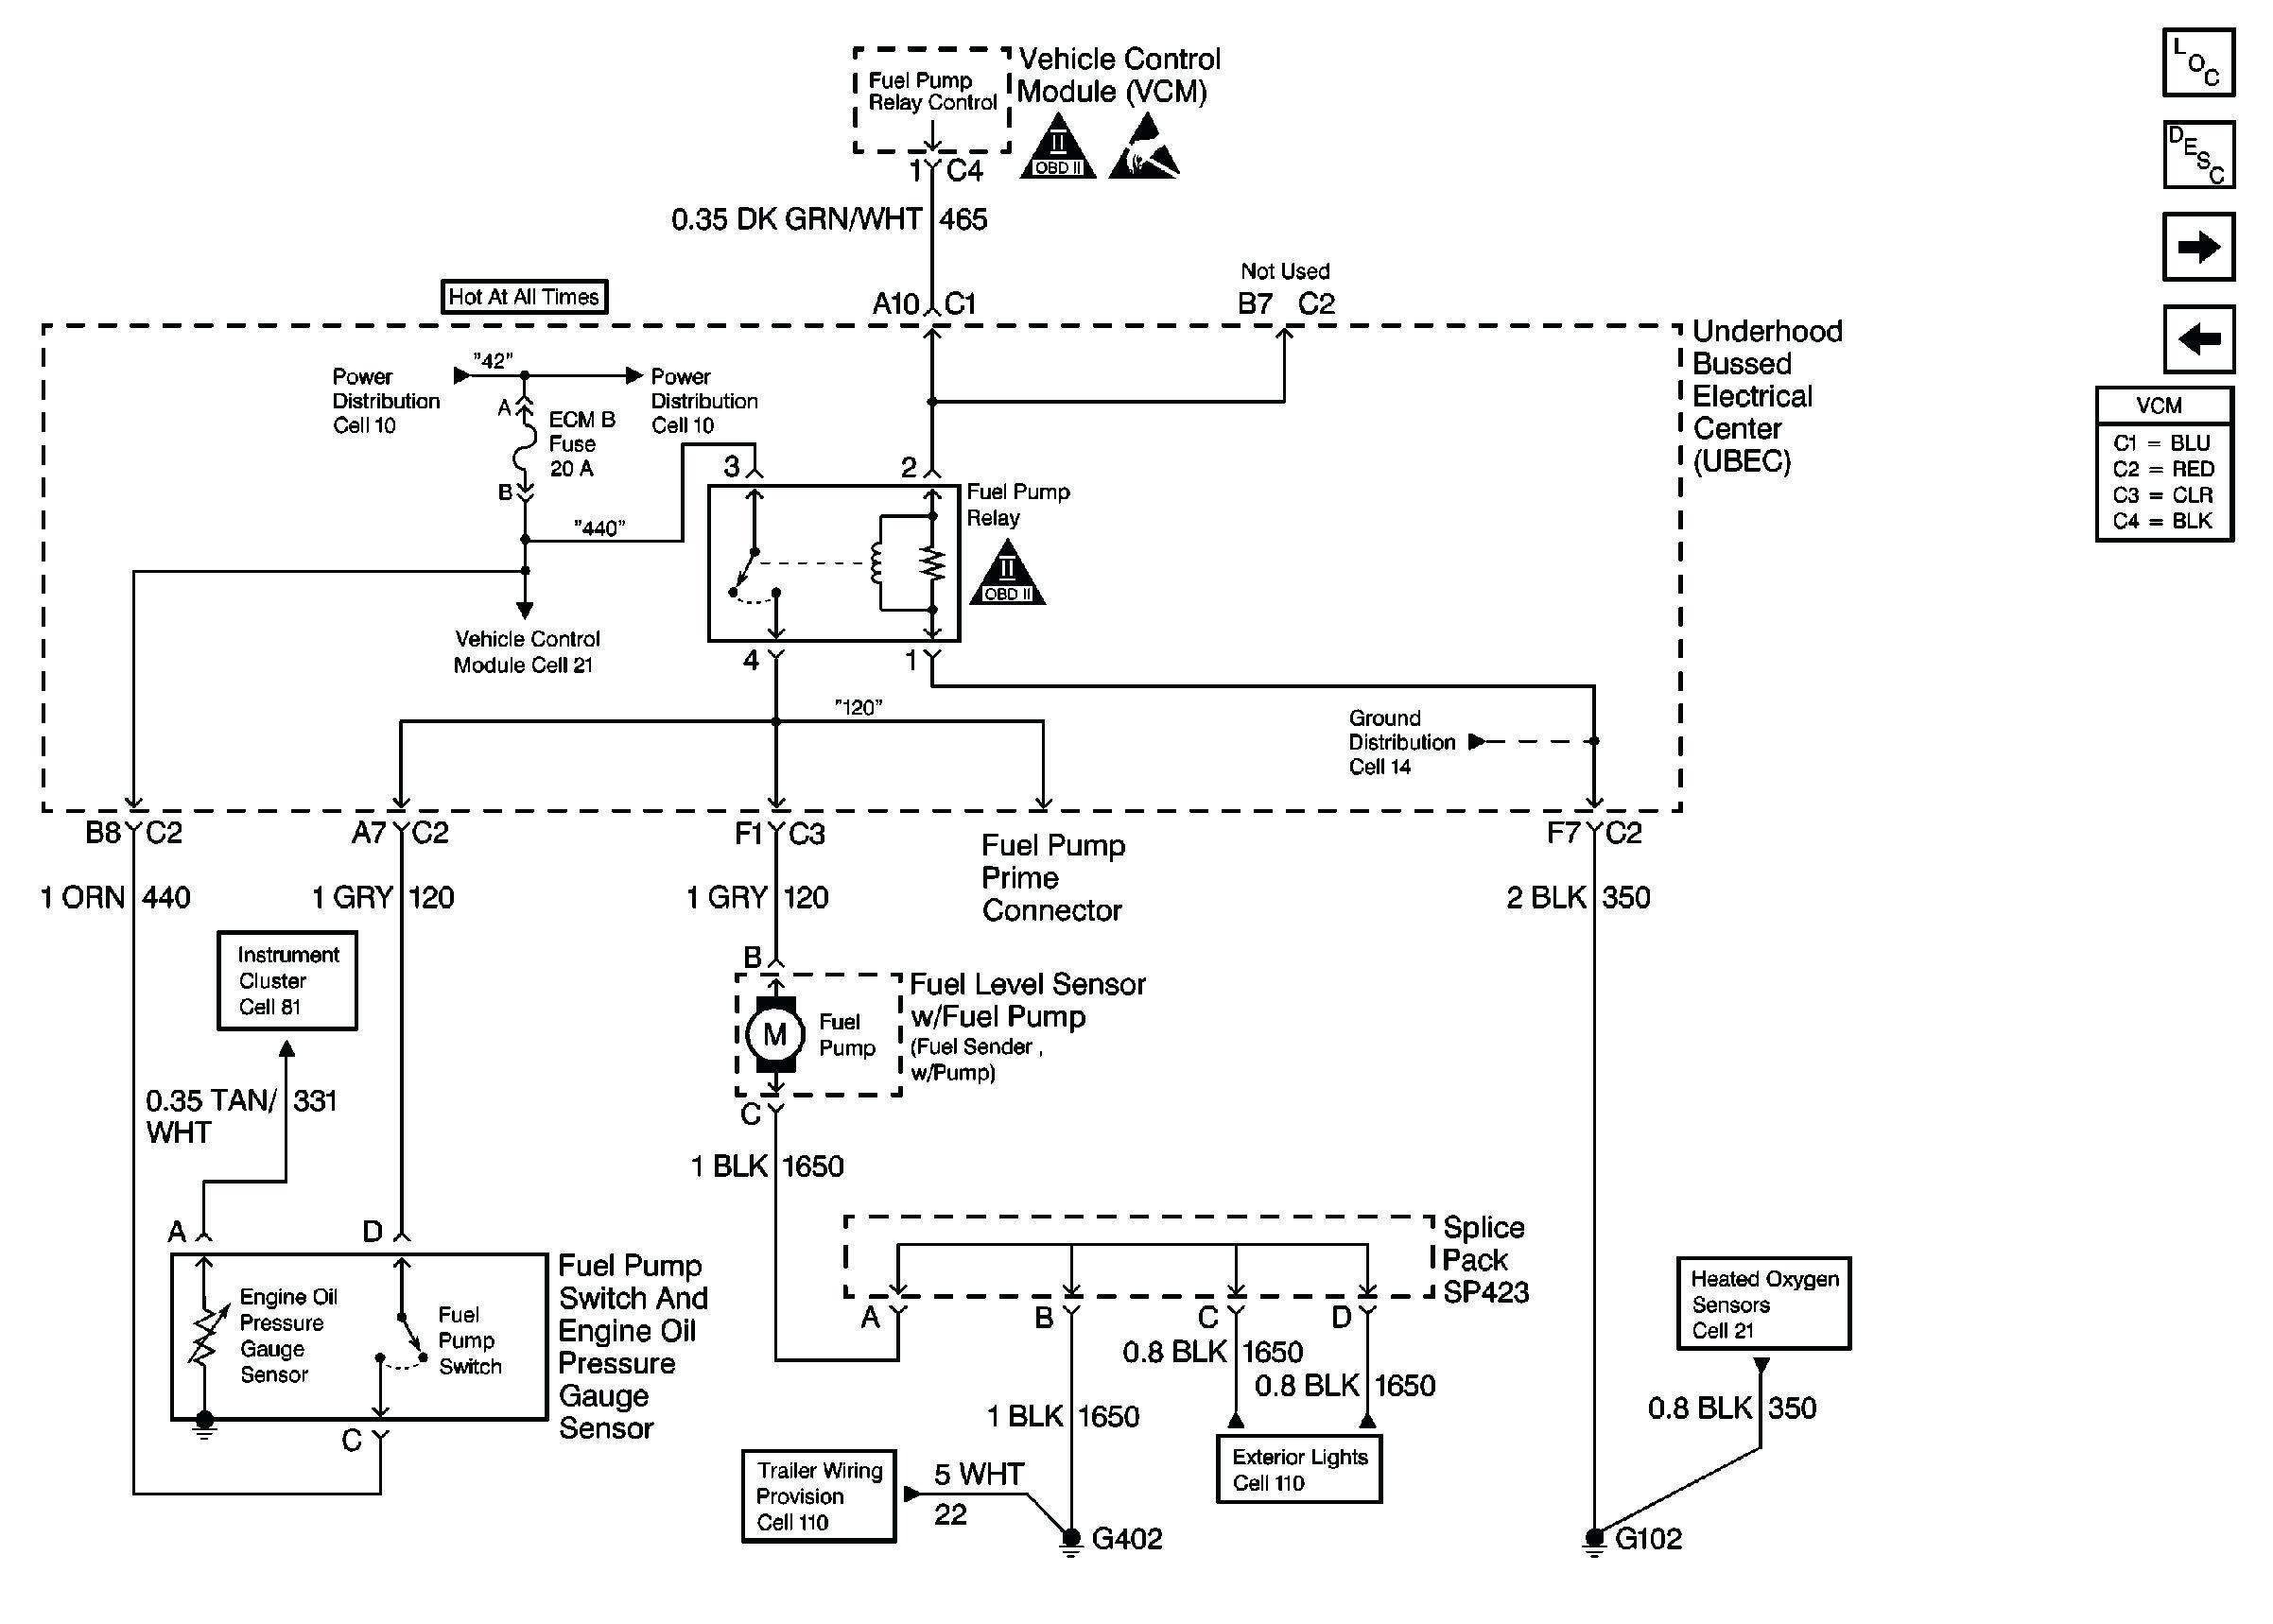 Safari Fuel Pump Wiring Harness Diagram 1993 - Wiring Diagram Data - Fuel Pump Wiring Harness Diagram